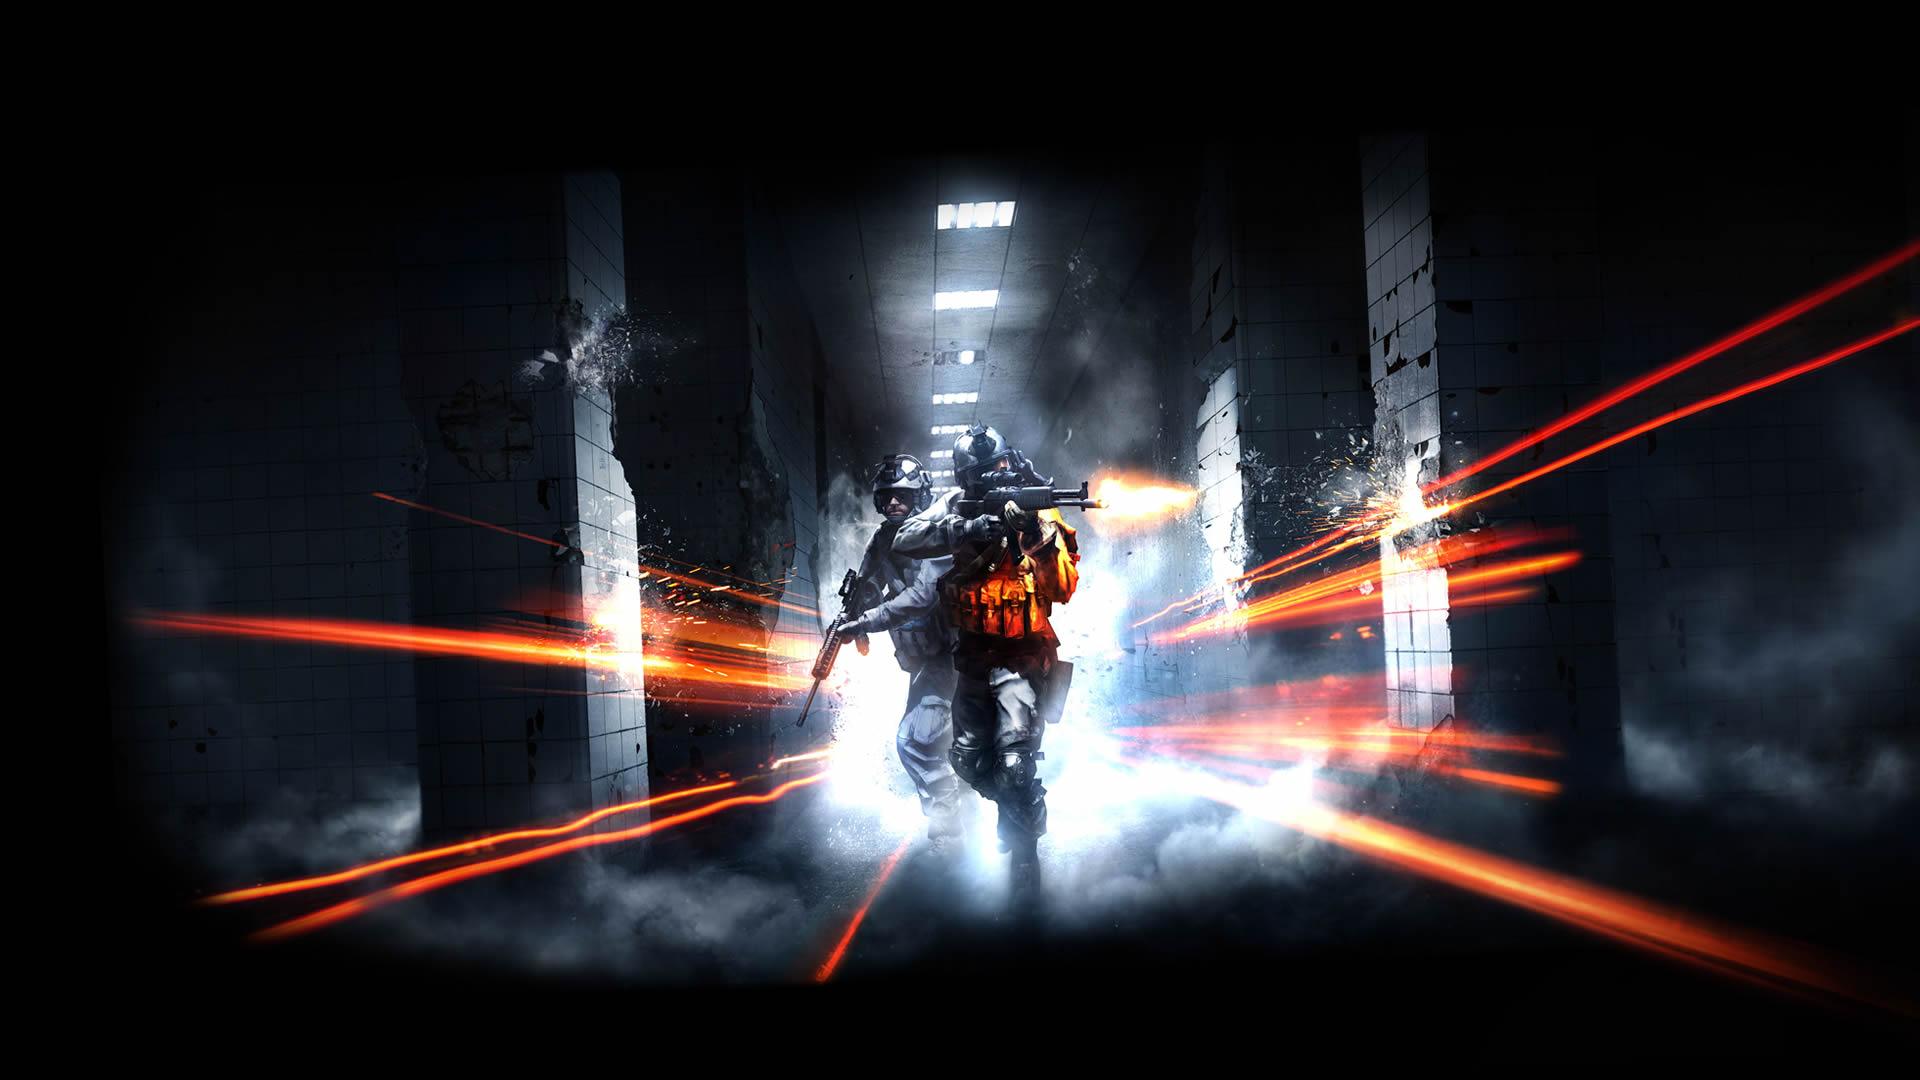 Battlefield 3 wallpaper 14